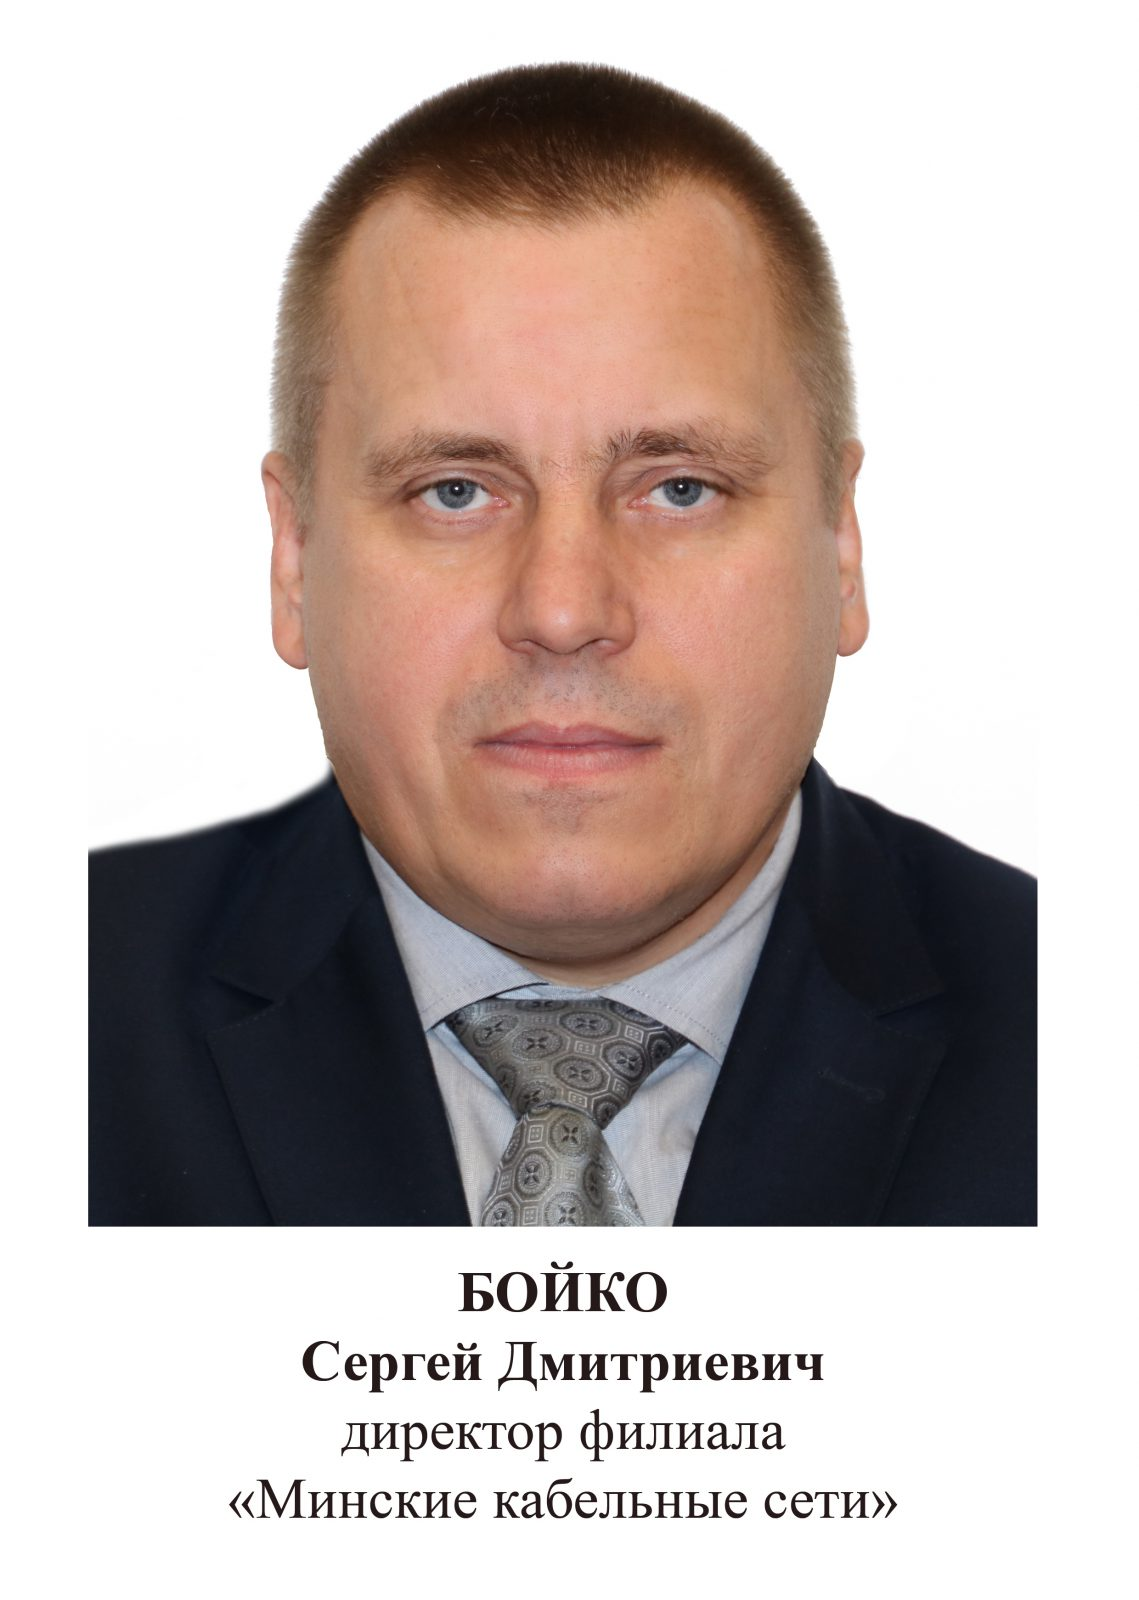 Бойко Сергей Дмитриевич